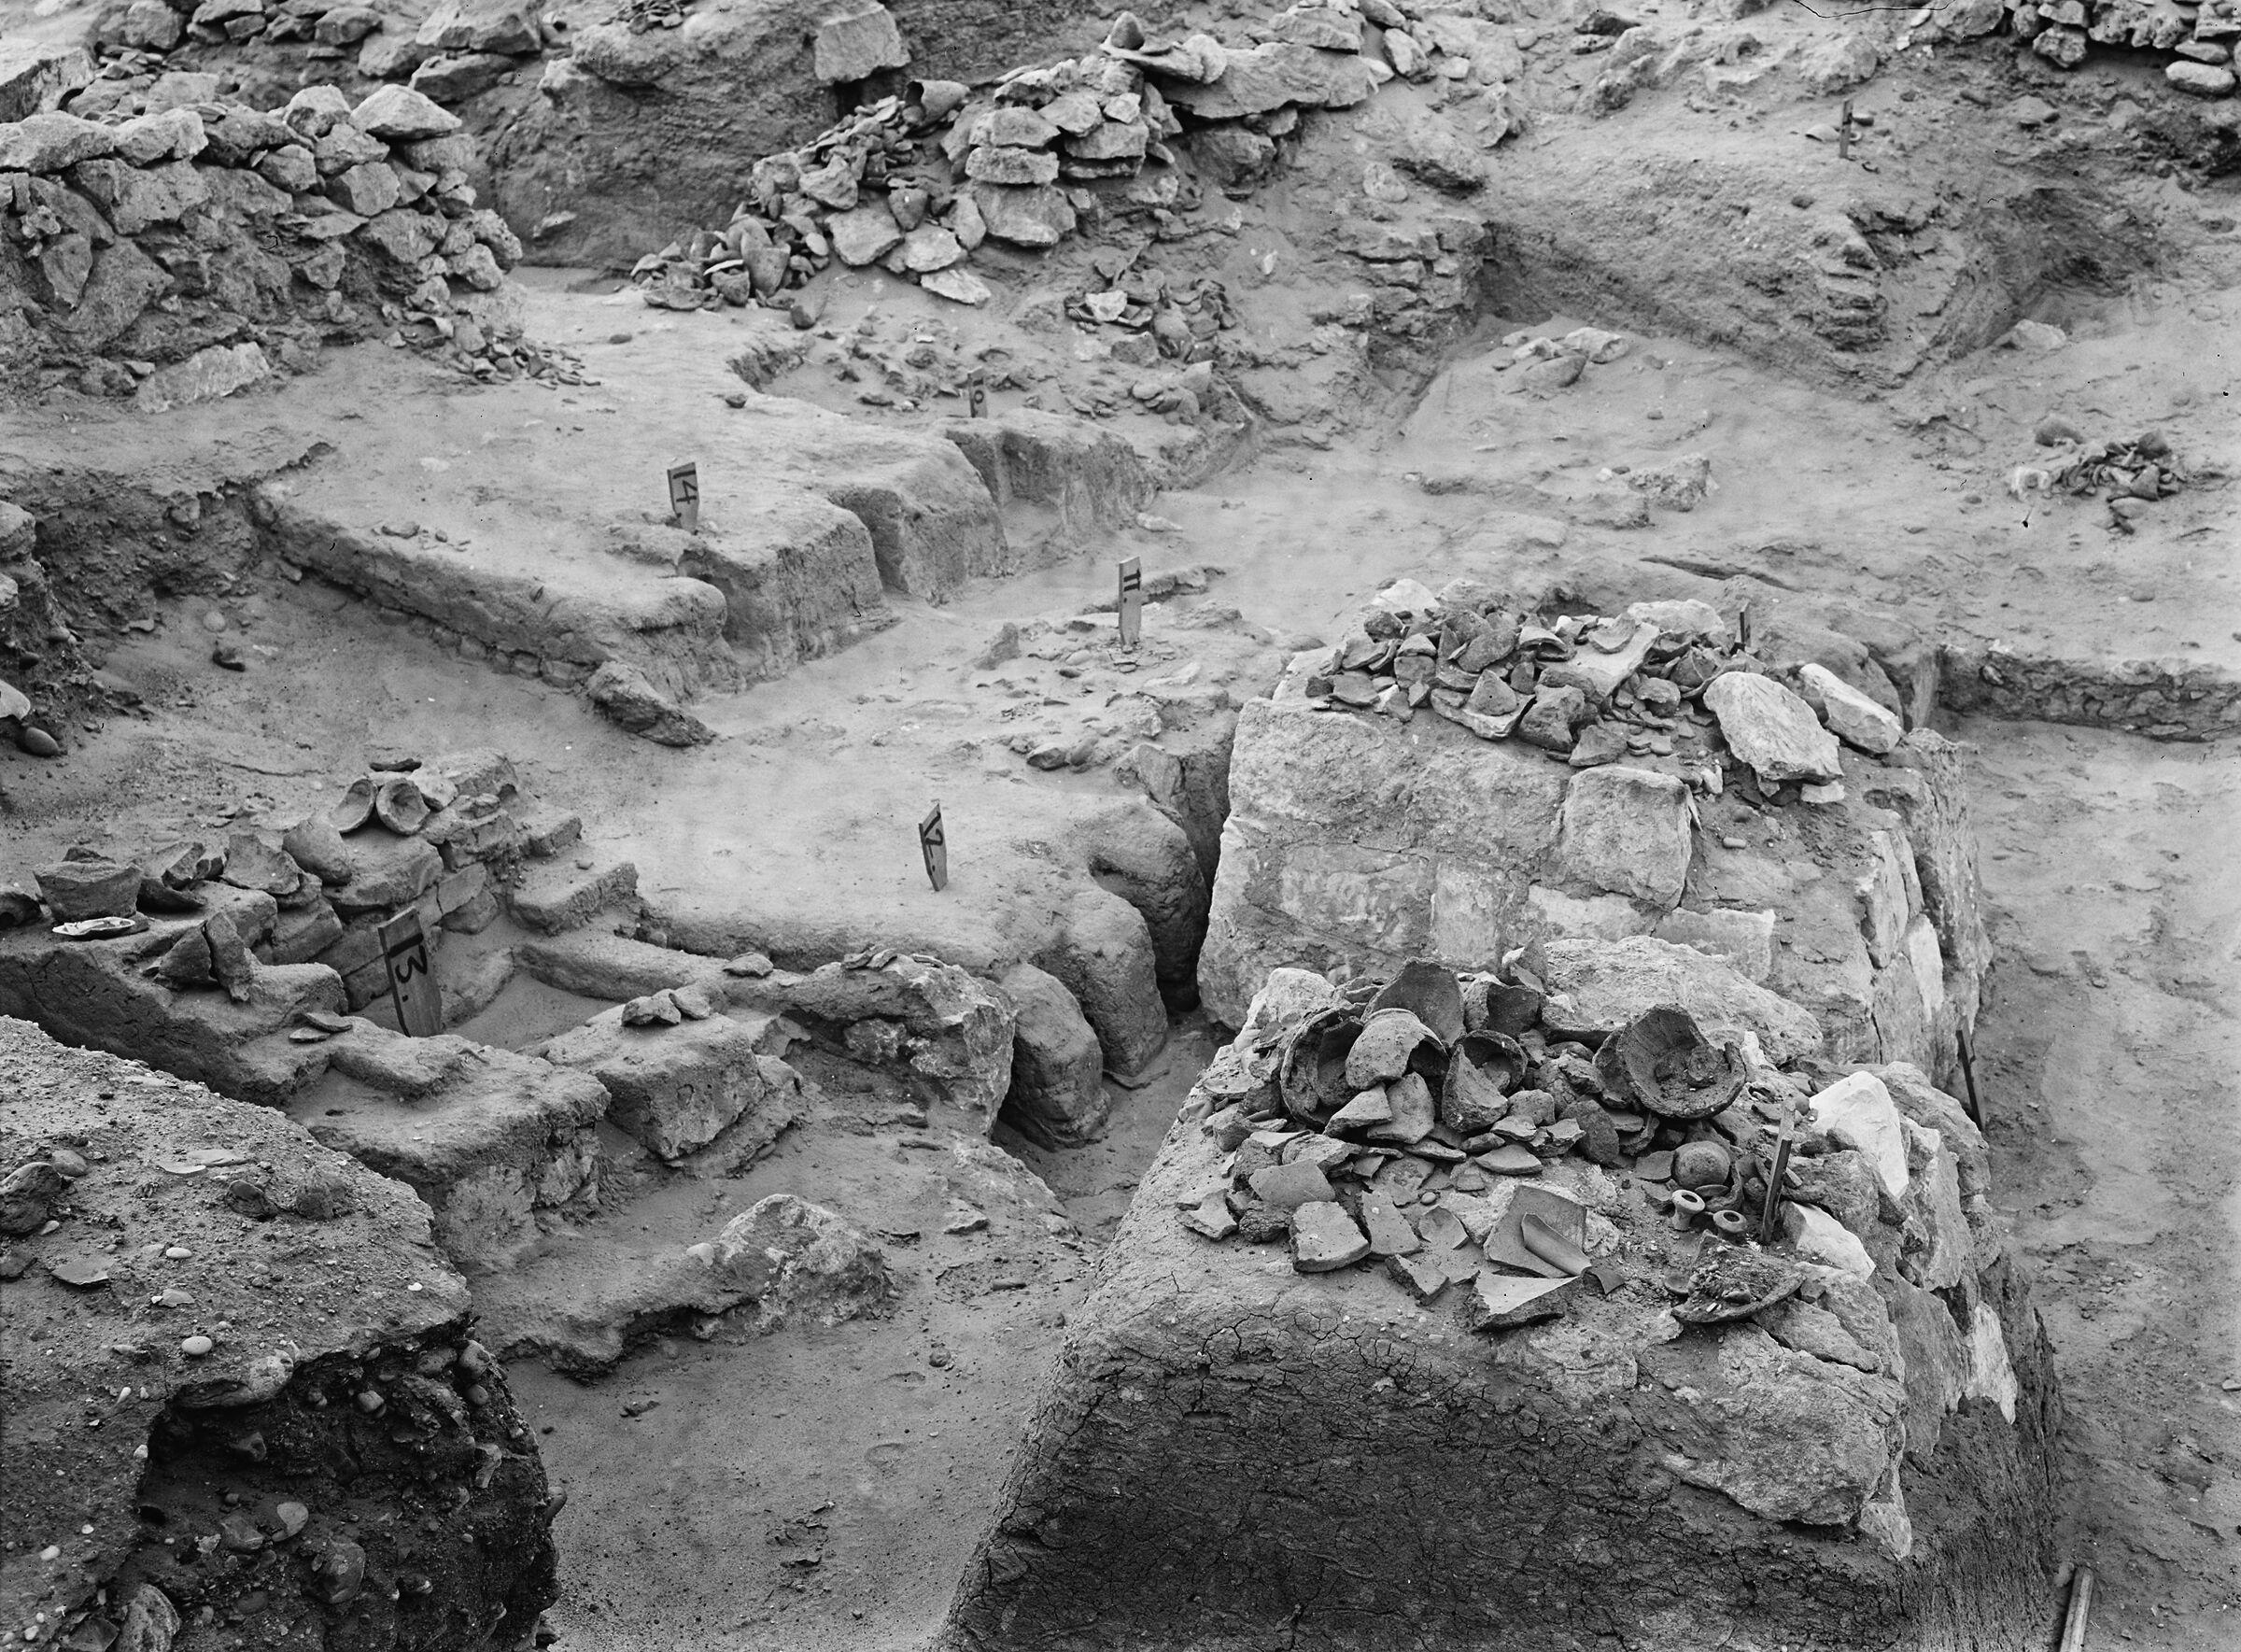 Wadi Cemetery (Reisner; north of W. Cem): Site: Giza; View: GW 6, GW 7, GW 9, GW 10, GW 11, GW 12, GW 13, GW 14